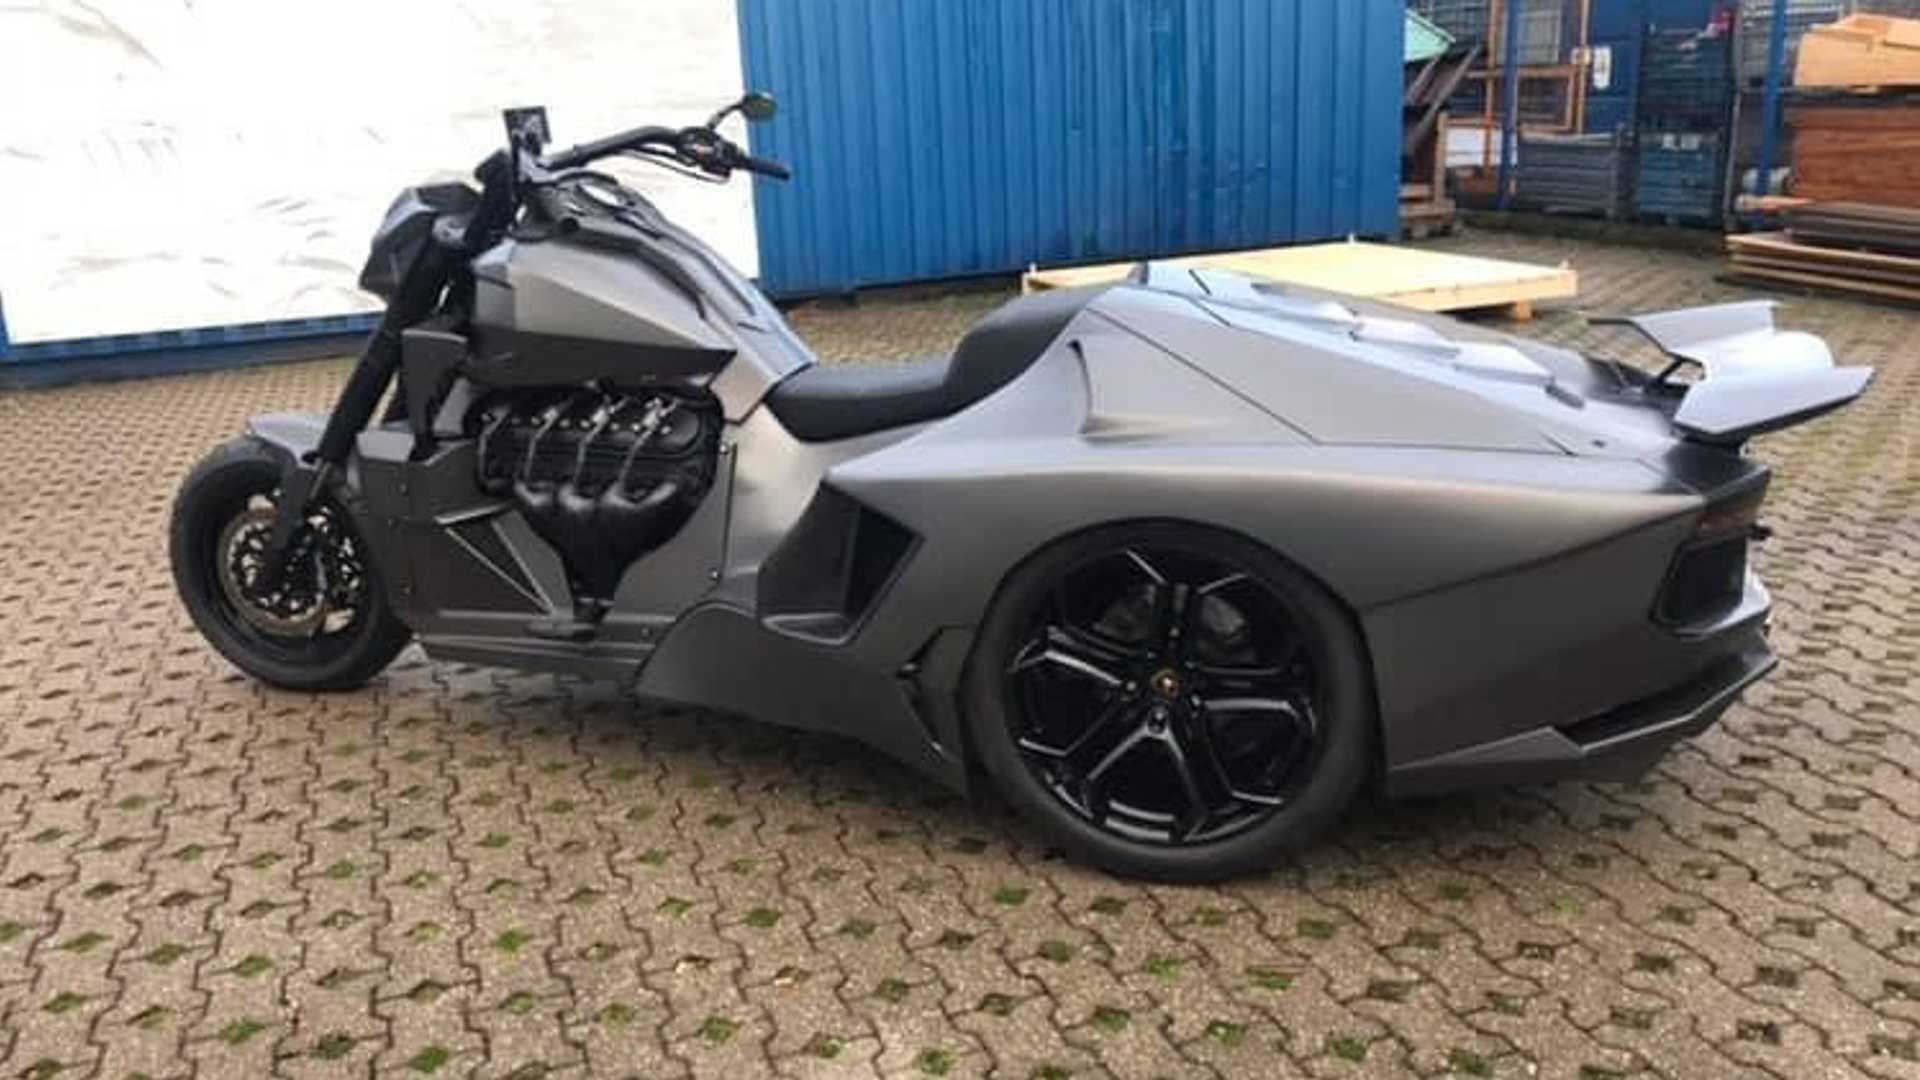 https: img-o.okeinfo.net content 2019 03 21 15 2033067 lamborghini-aventador-ini-hanya-memiliki-roda-tiga-uX8GC9upVU.jpg